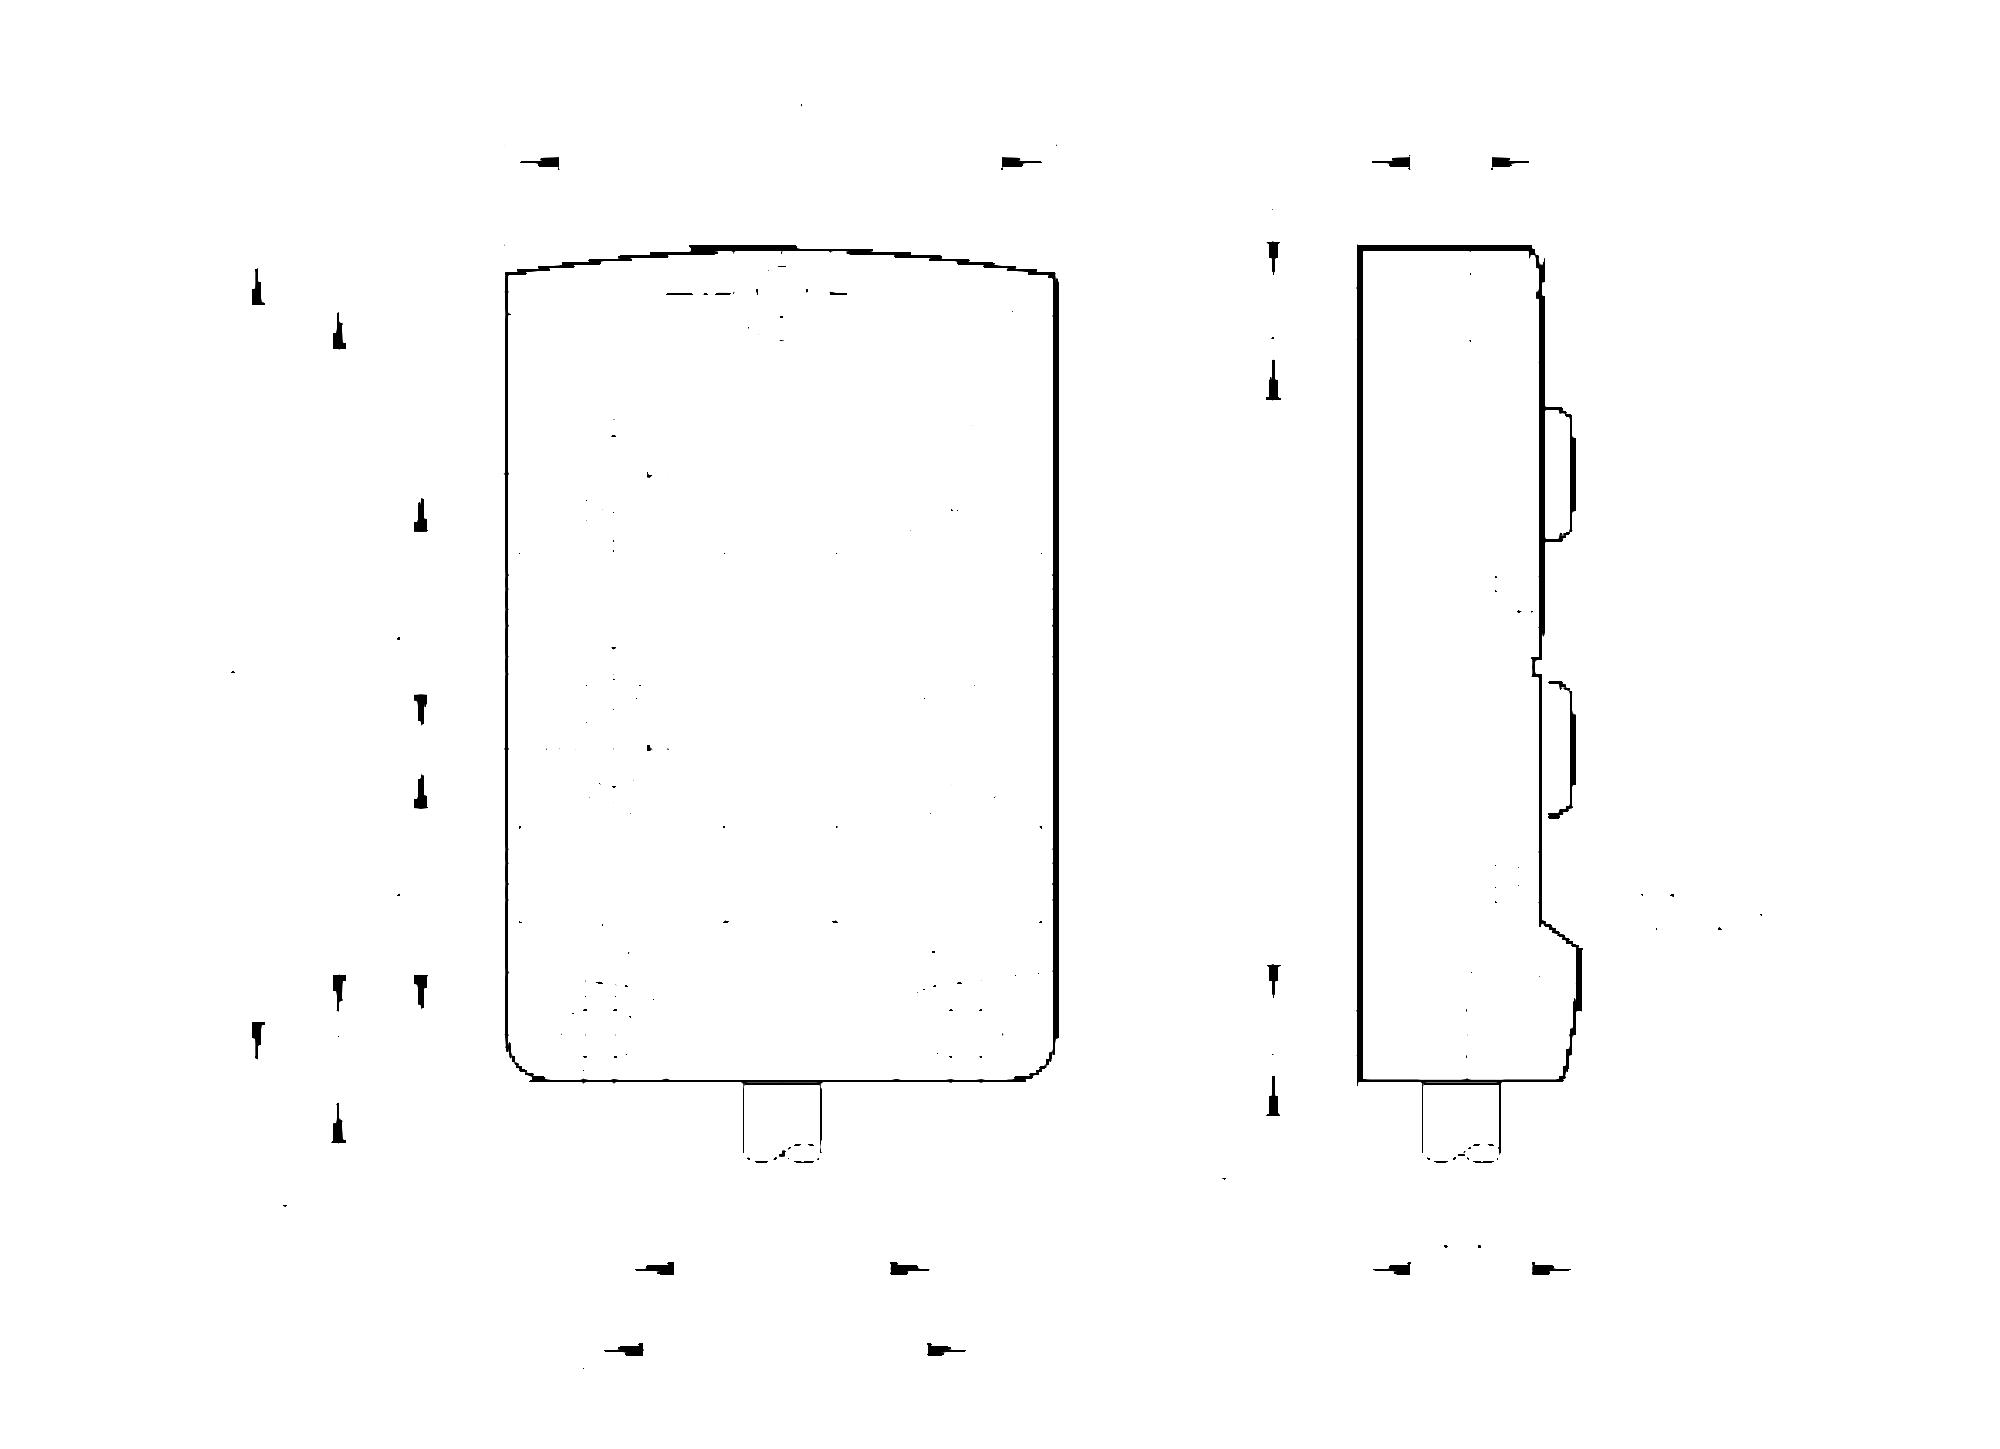 ebc026 - splitter box